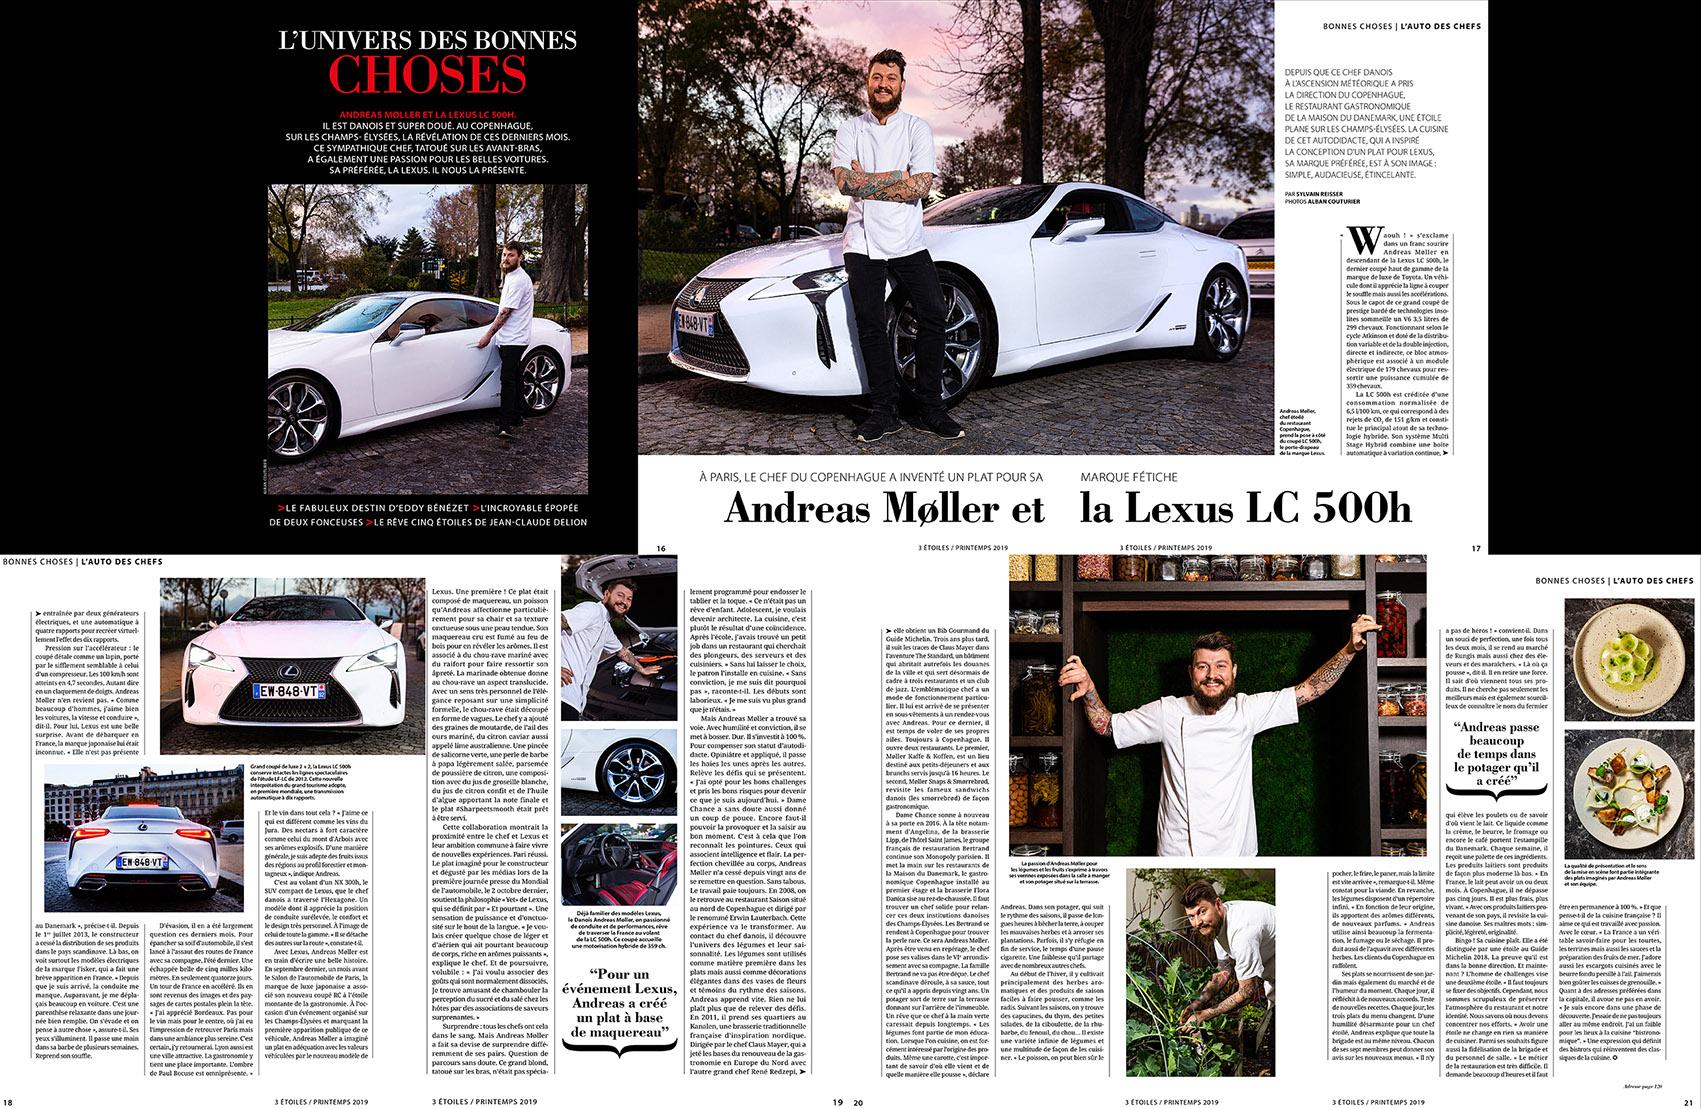 Magazine 3 etoiles, Mars 2019 Chef Andreas Moller, restaurant Copenhague, 1 etoile au guide Michelin ©Alban Couturier